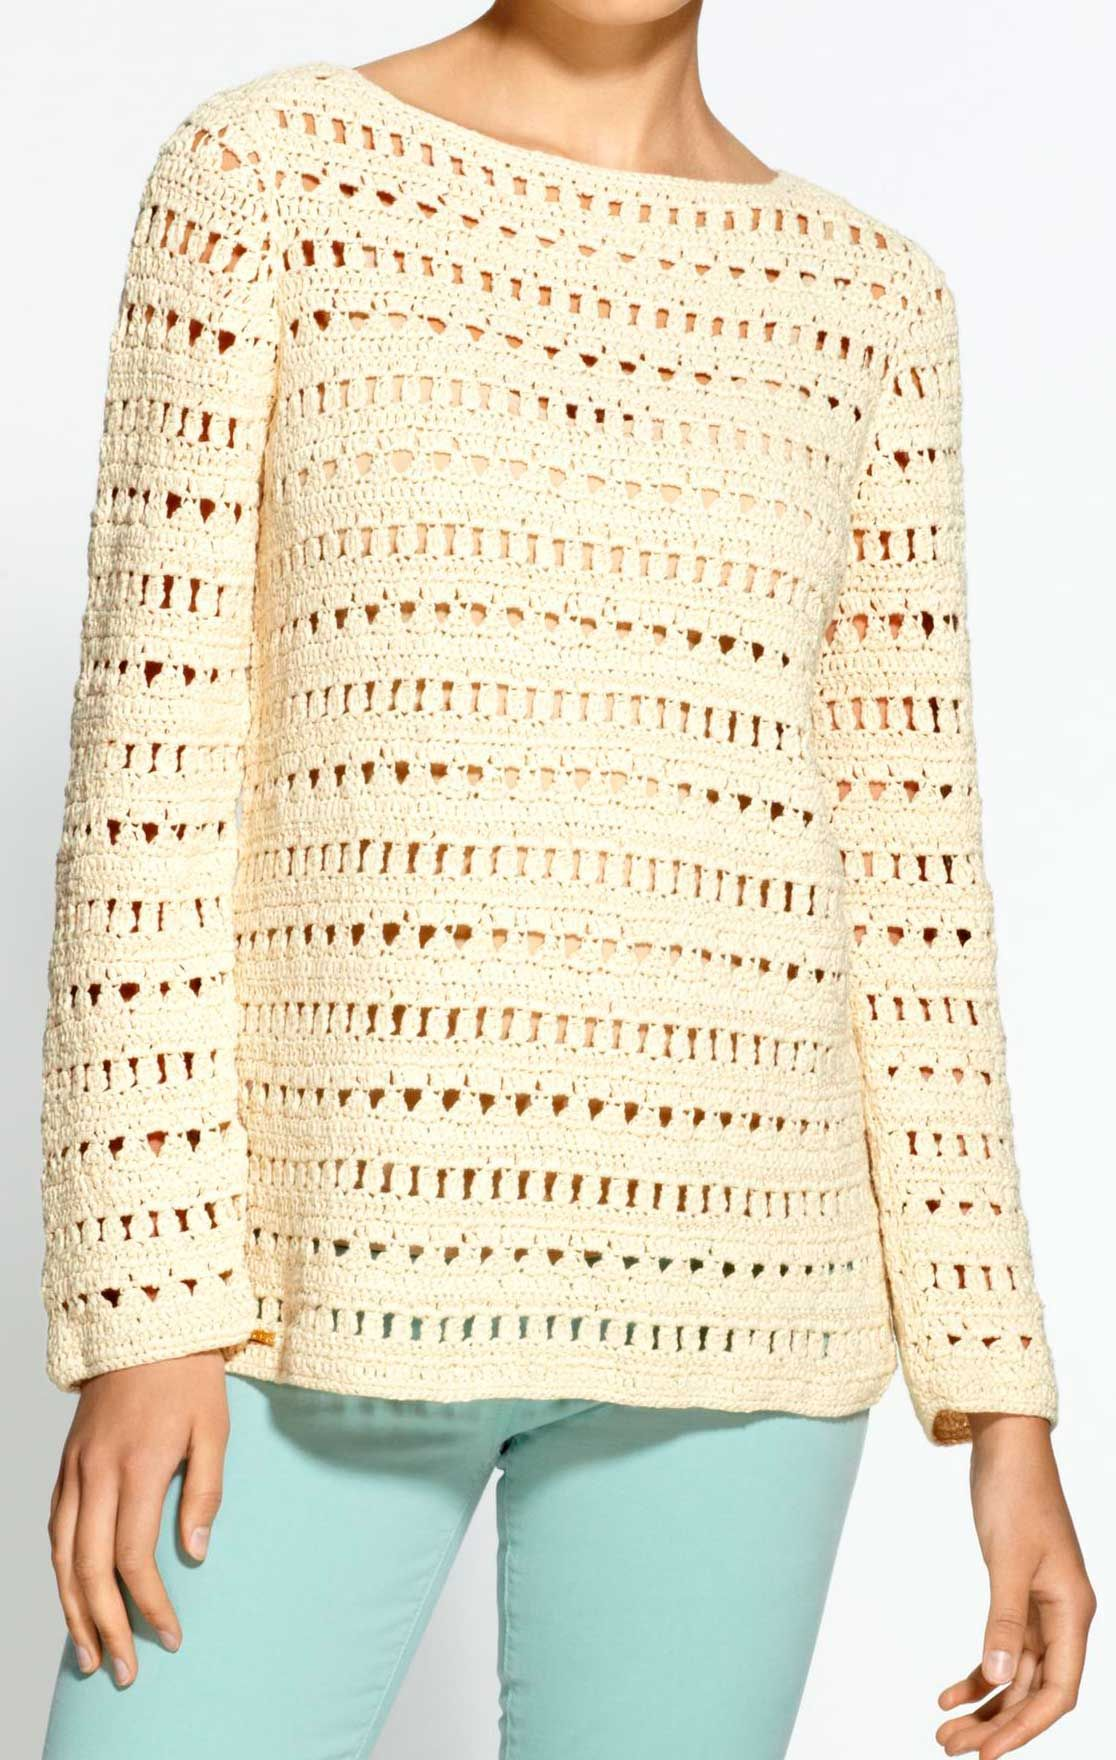 Crochet tunic PATTERN, detailed tutorial for every row + HQ charts, trendy crochet tunic pattern, sweater pattern #crochettunicpattern